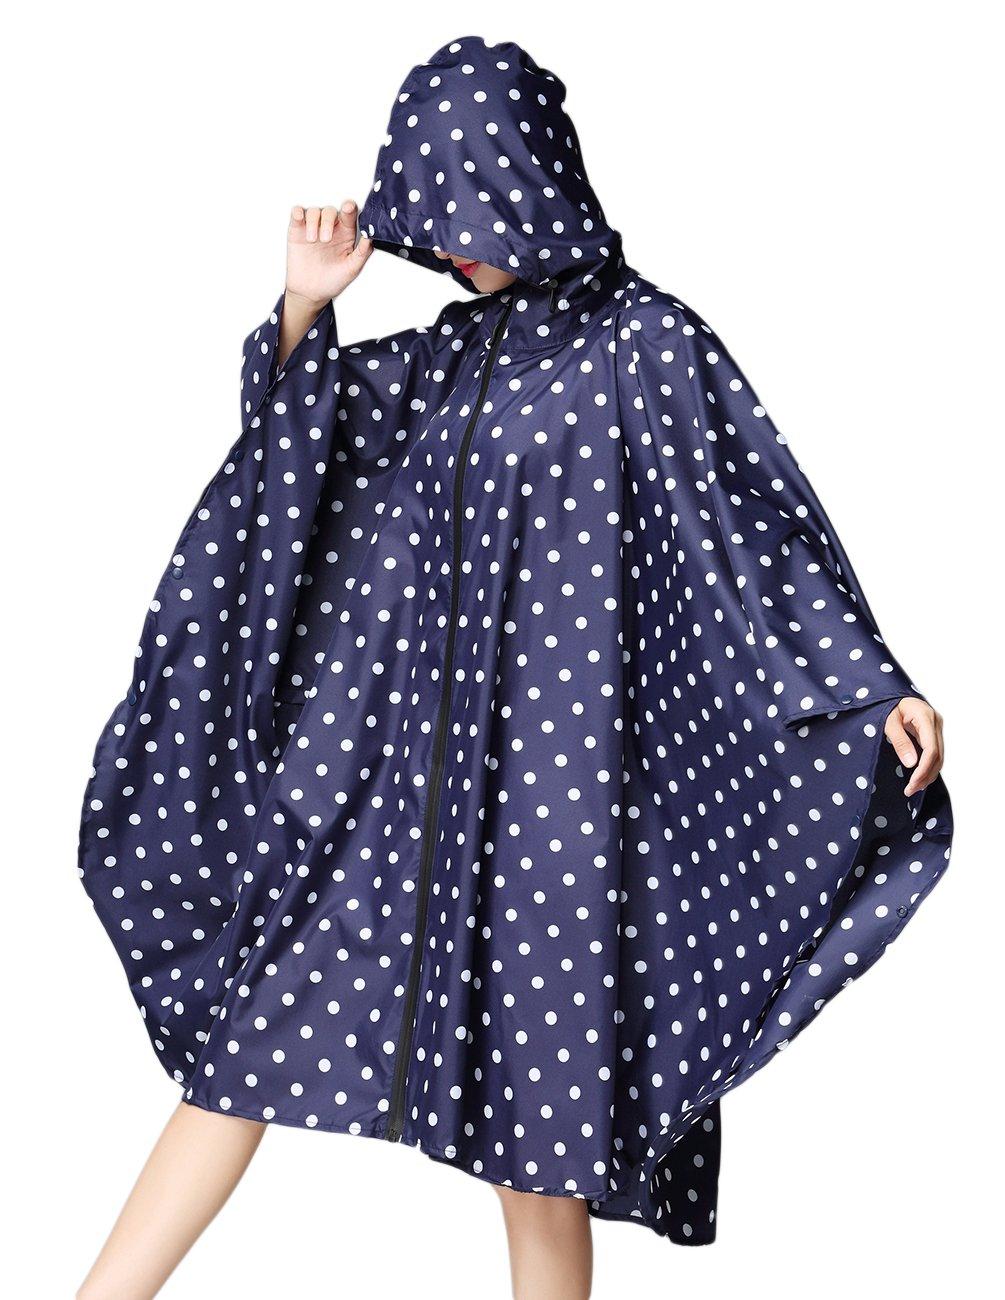 Buauty Womens Hooded Zip Up Waterproof Active Outdoor Rain Jacket Raincoats Lightweight Poncho Plus Size